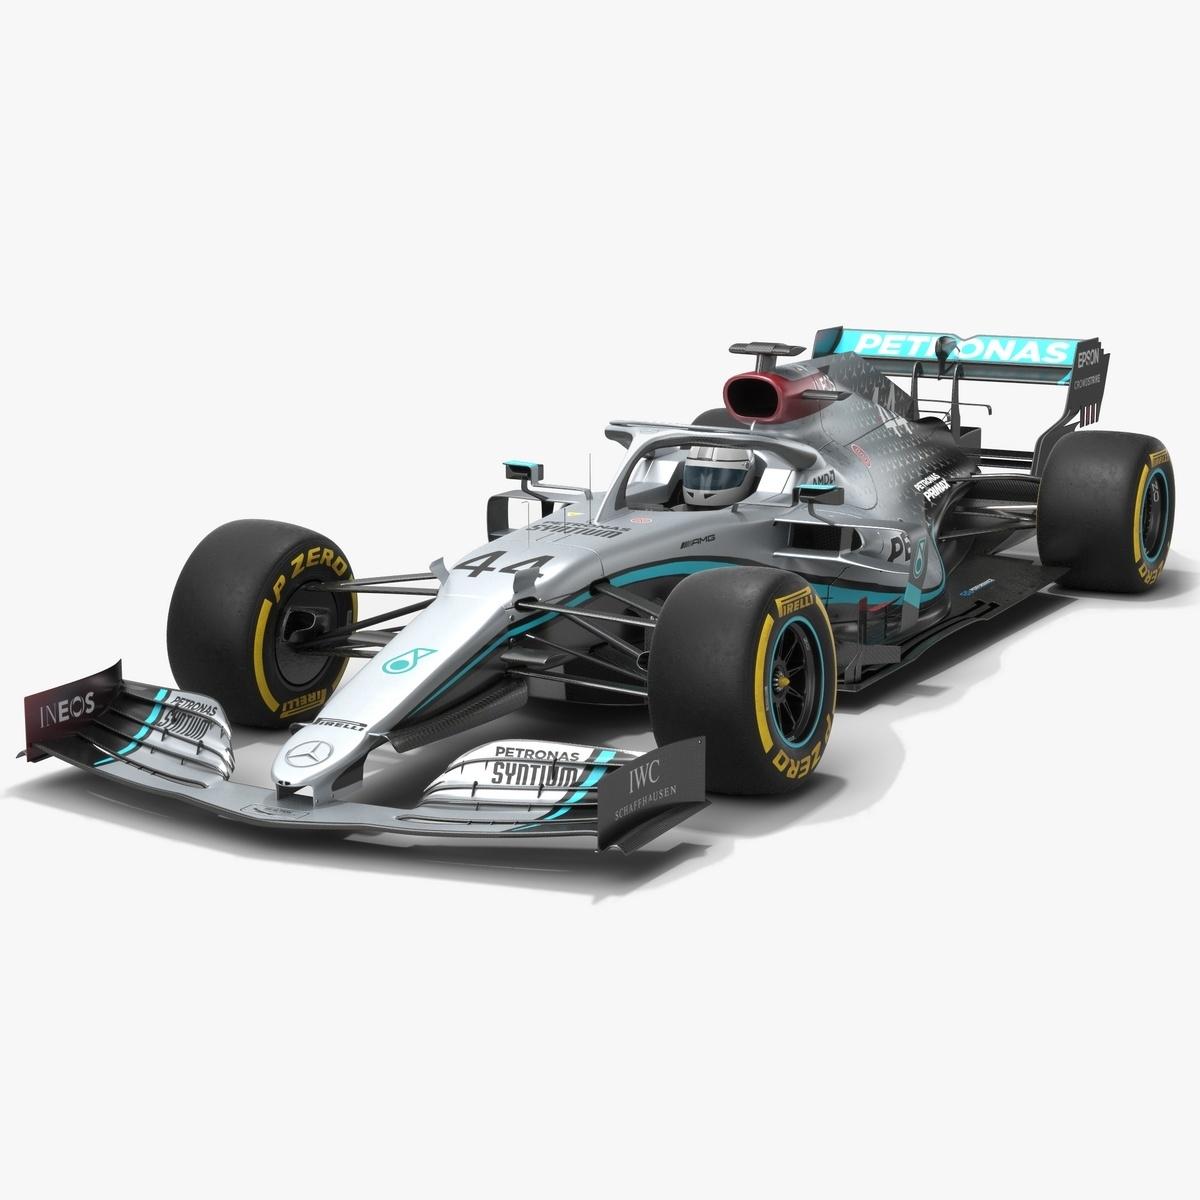 mercedes f1 w11 formula 1 model